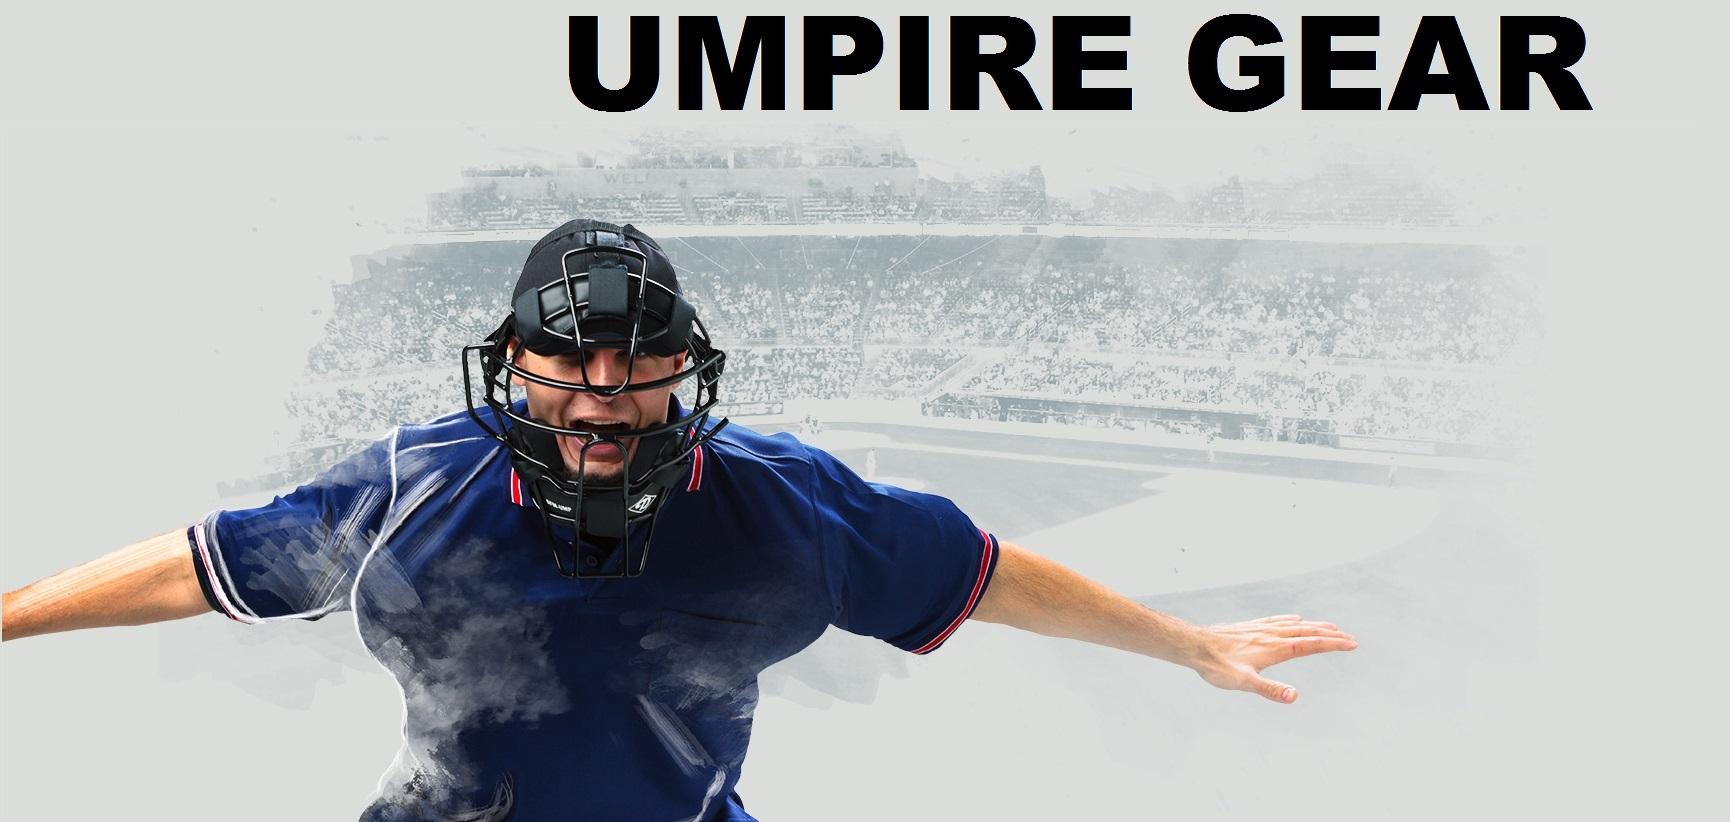 Umpire Uniforms and Equipment